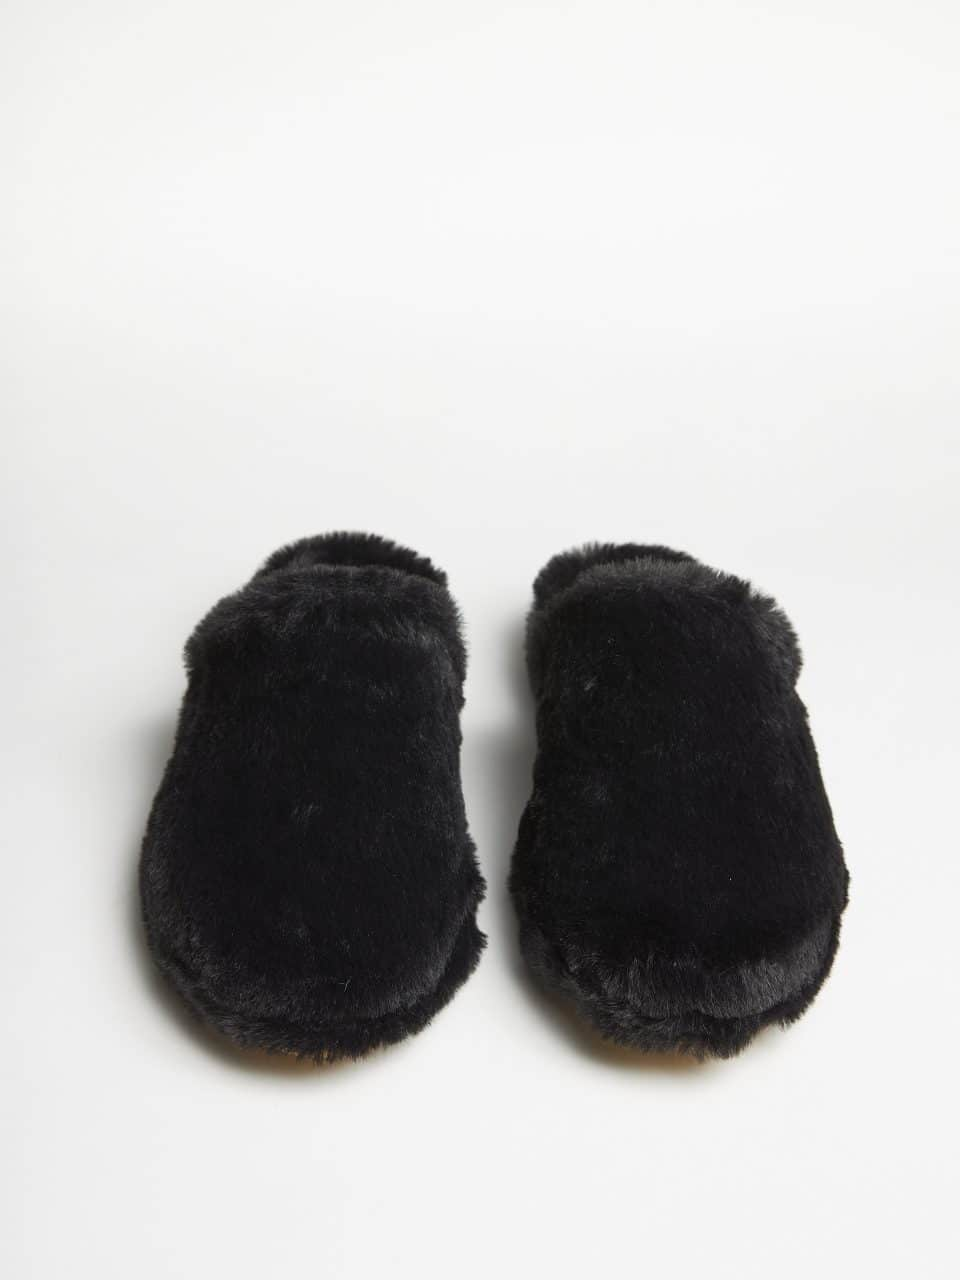 Mally Pelo Negro. Slippers en Loyna Shoes